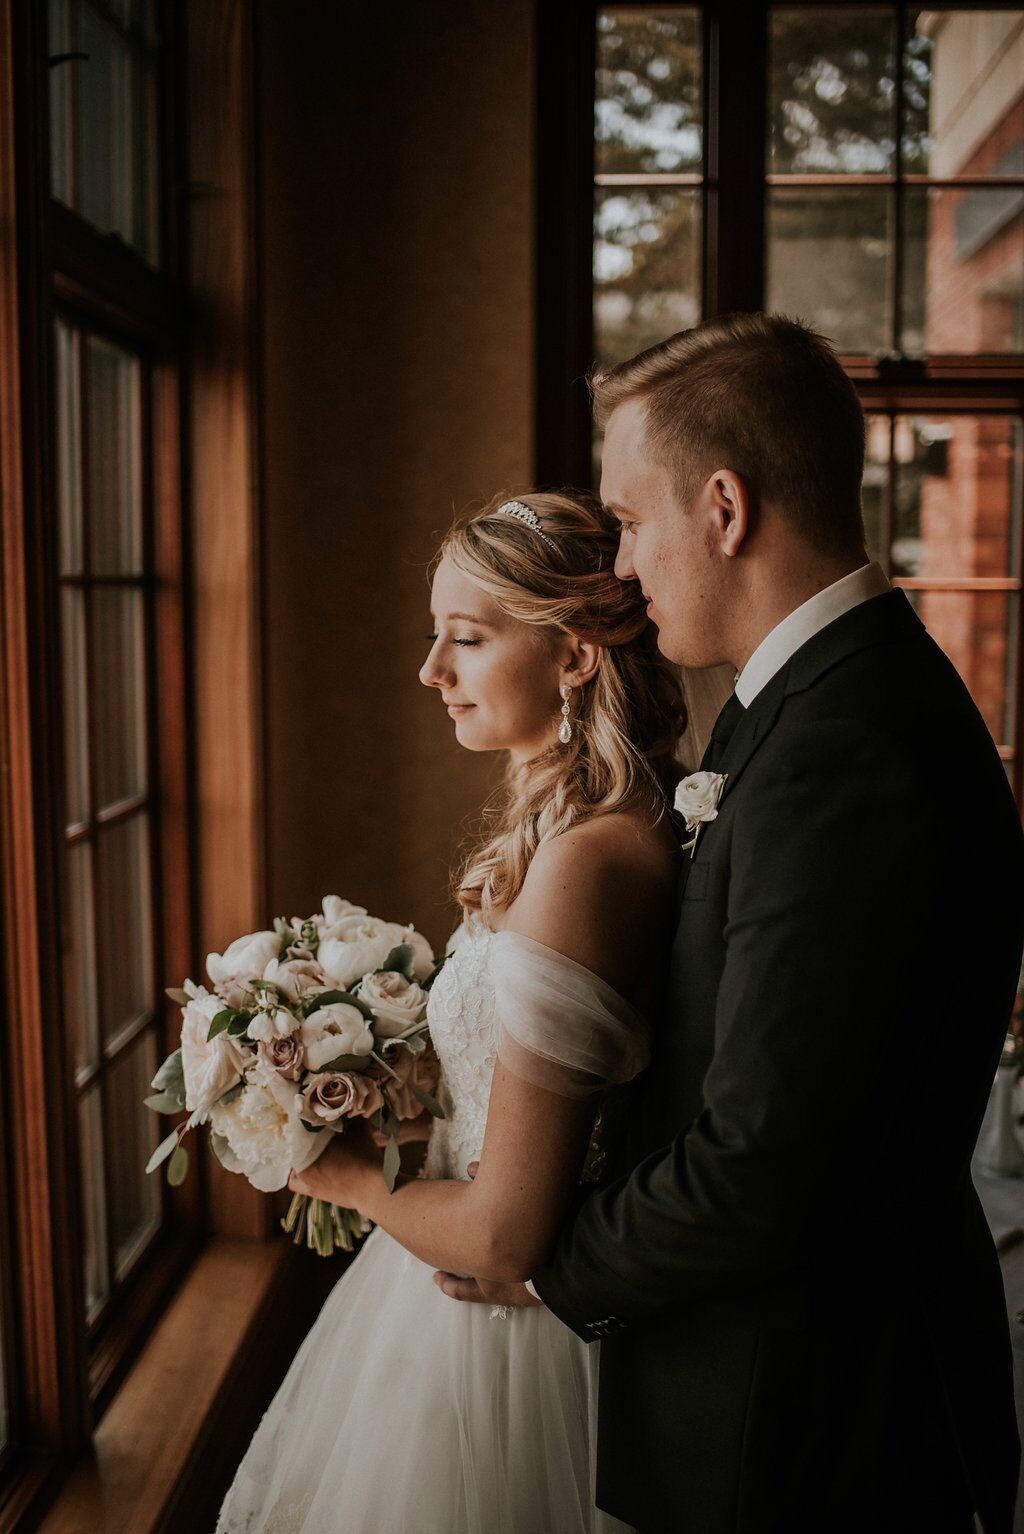 Romantic Newlyweds look out window of Oak Bay Beach Hotel